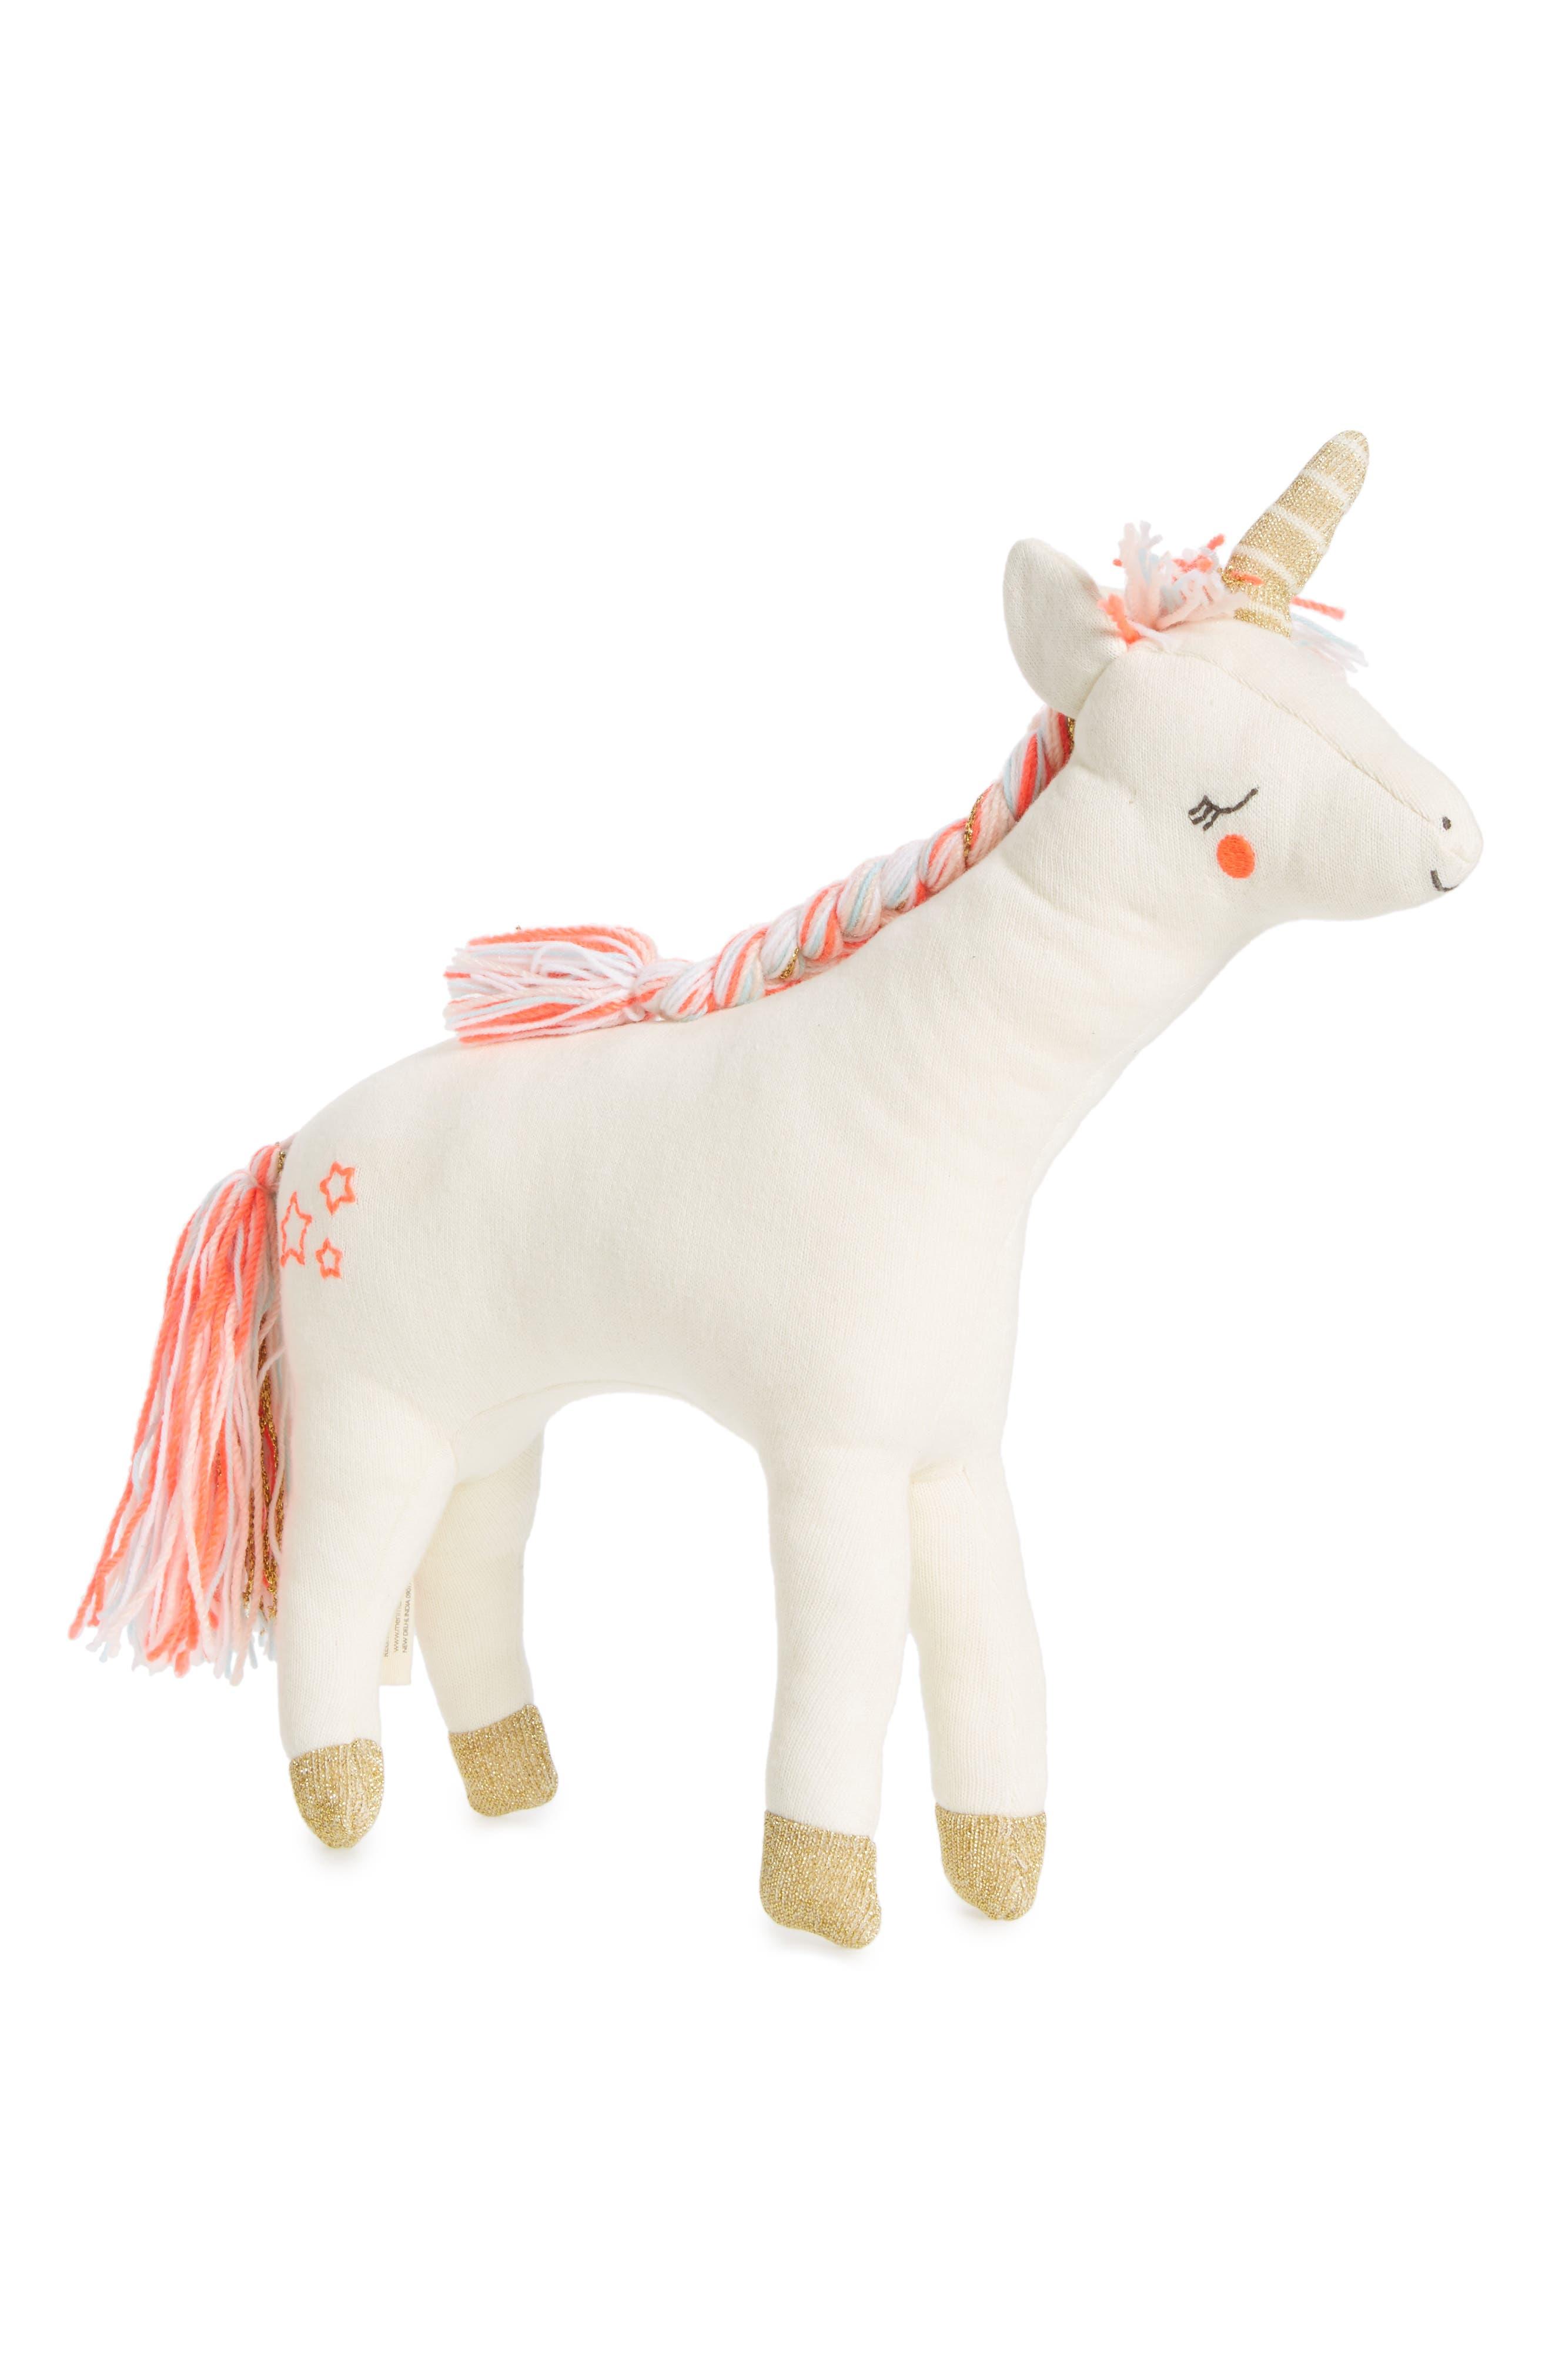 Knit Organic Cotton Unicorn Cushion/Toy,                             Main thumbnail 1, color,                             650